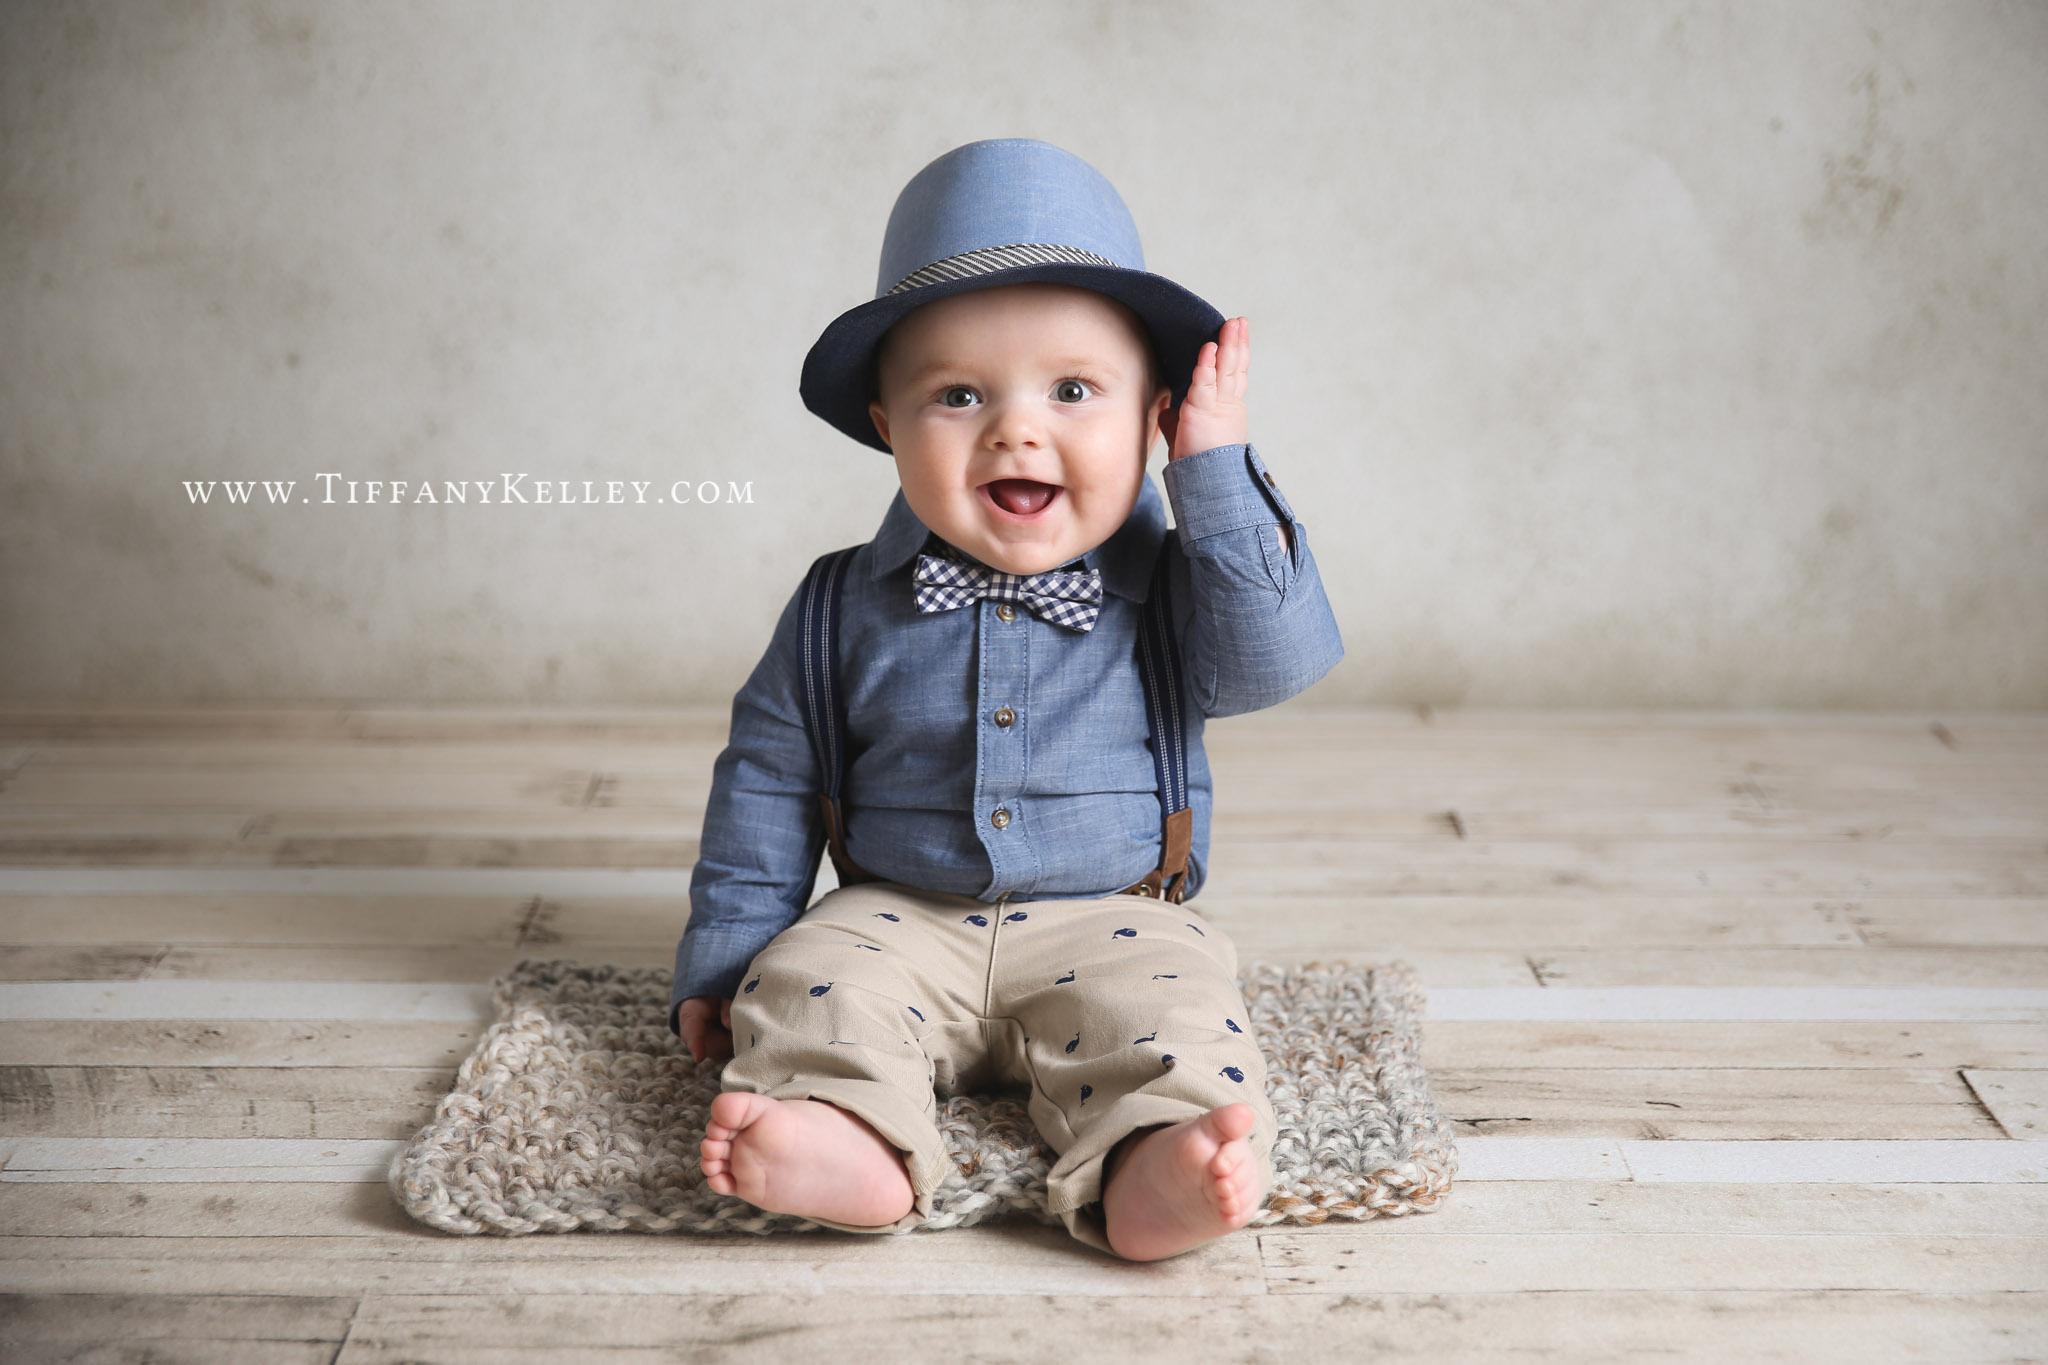 Cole 6-Months Branson Springfield MO Newborn Photographer - Tiffany Kelley Photography